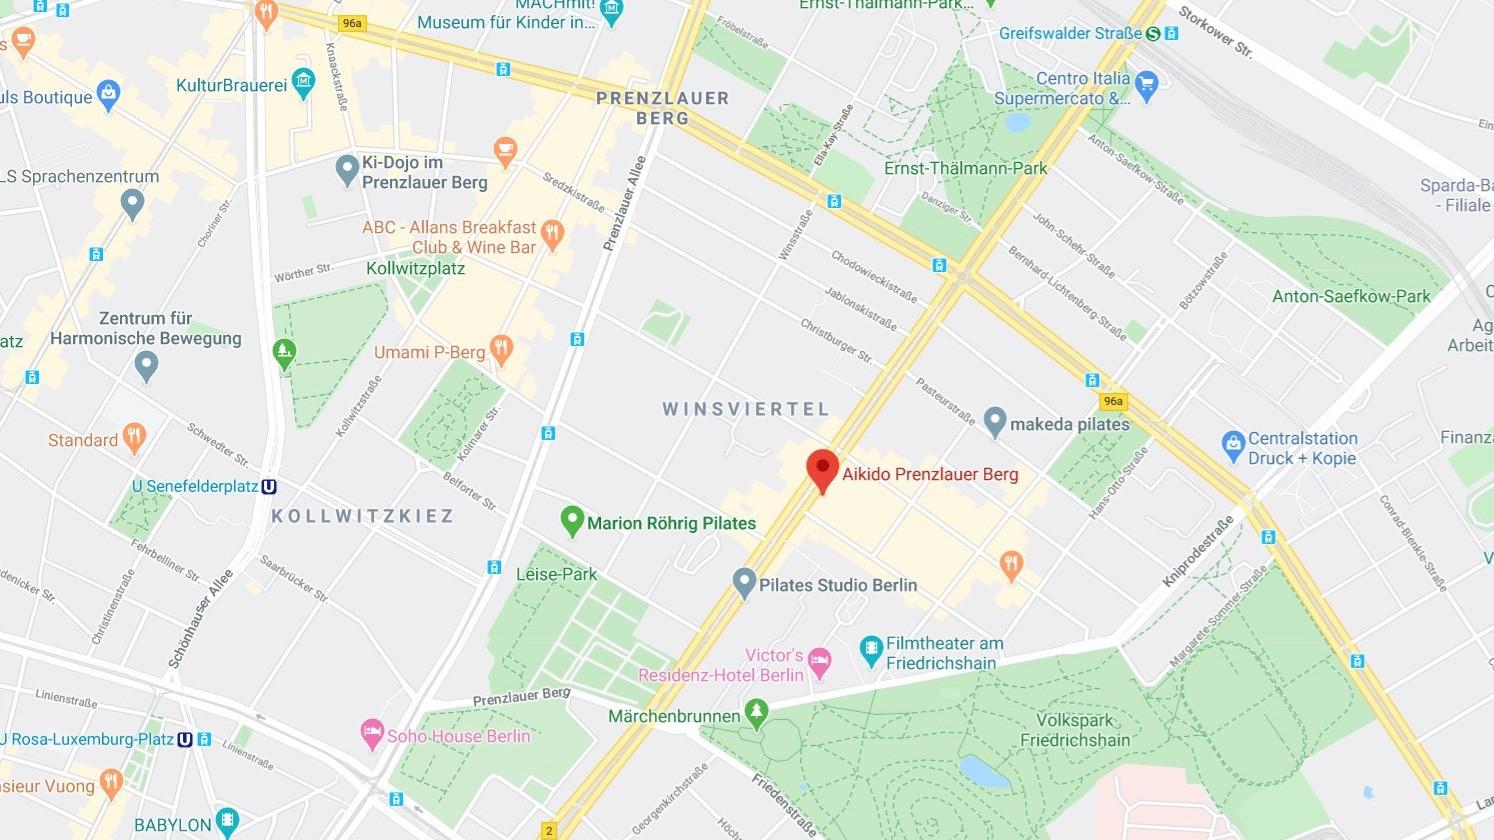 Kursraum AIKIDO Prenzlauer Berg - Google